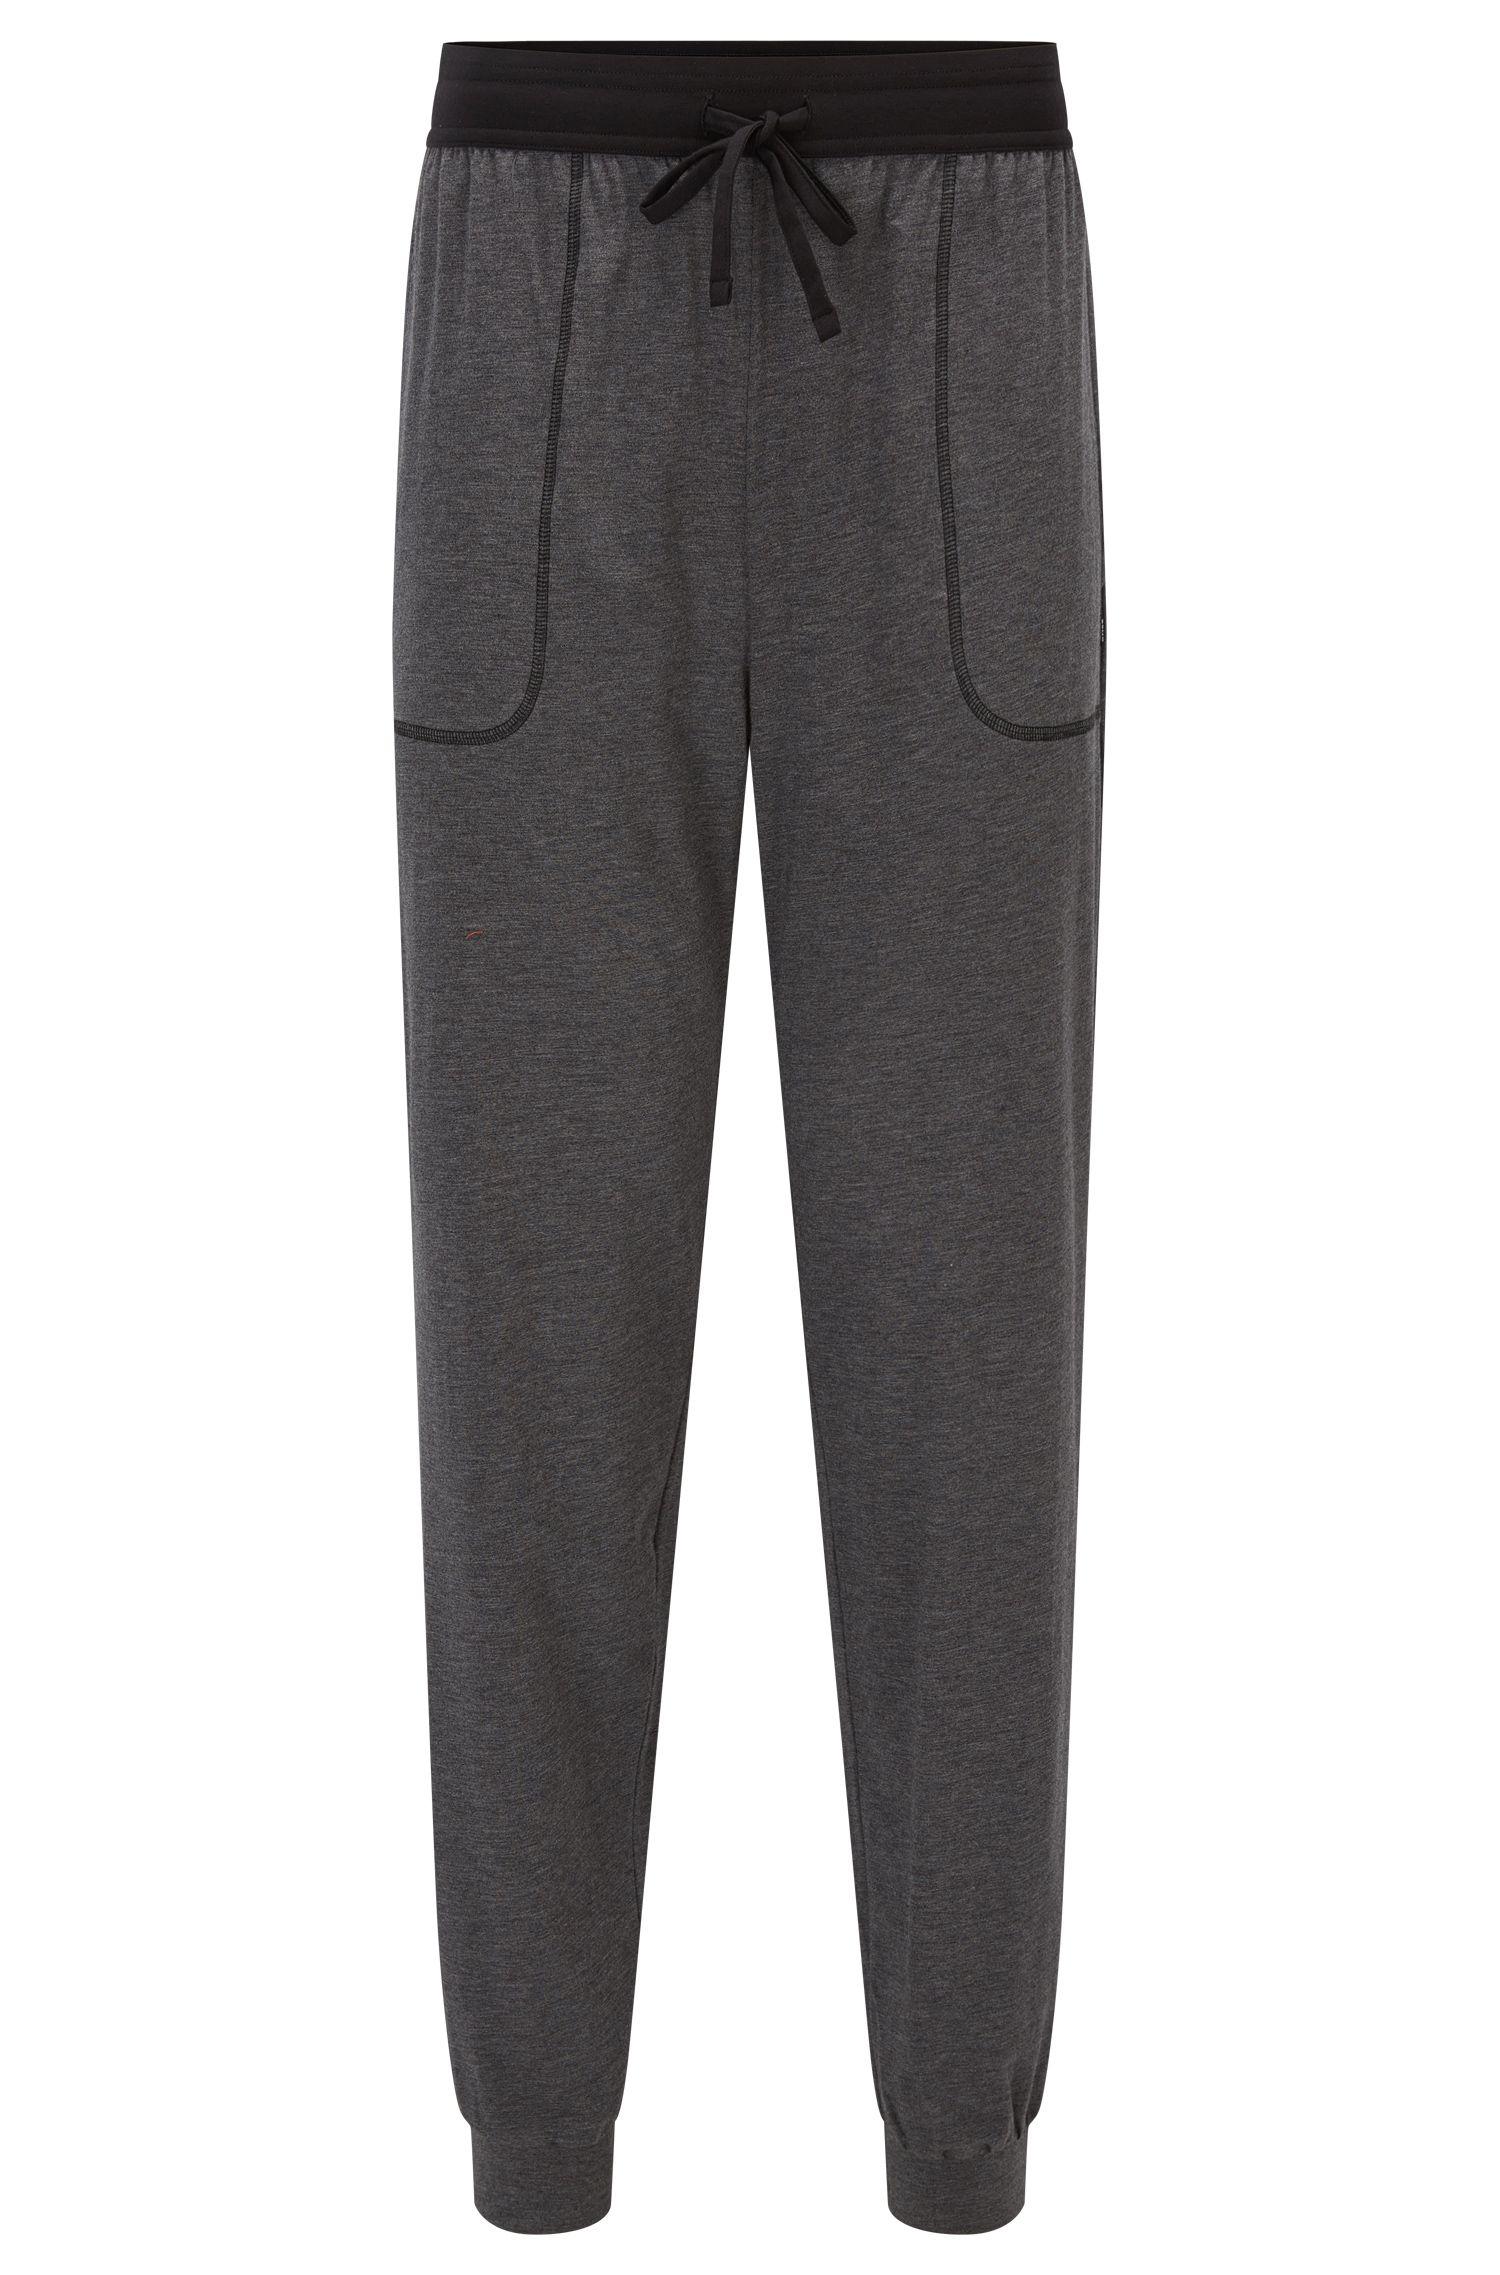 Stretch Cotton Sweat Pants | Long Pant CW Cuffs, Charcoal